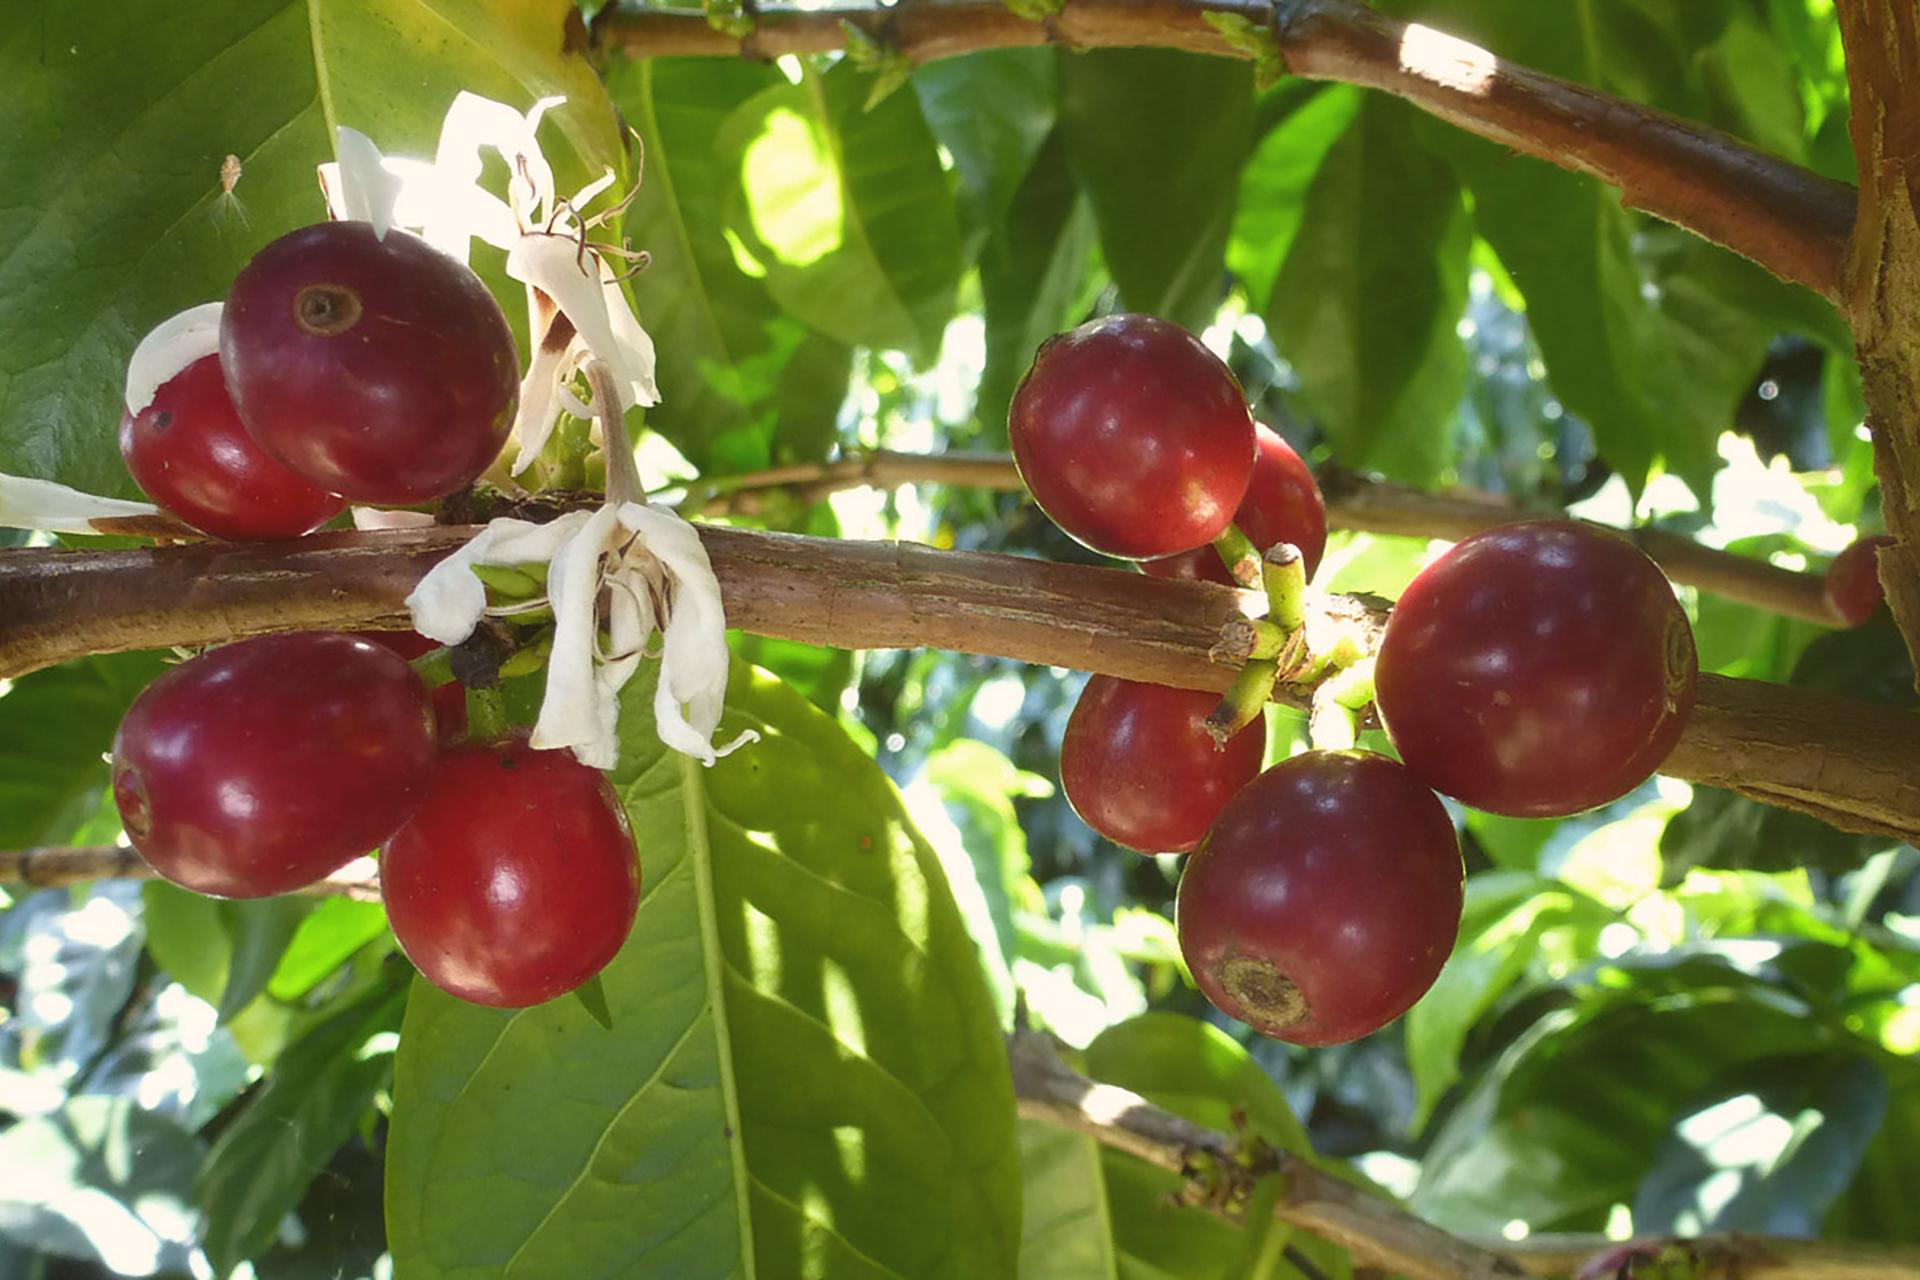 Plantation_Cafeier_Cafeotheque_26 FInal 2